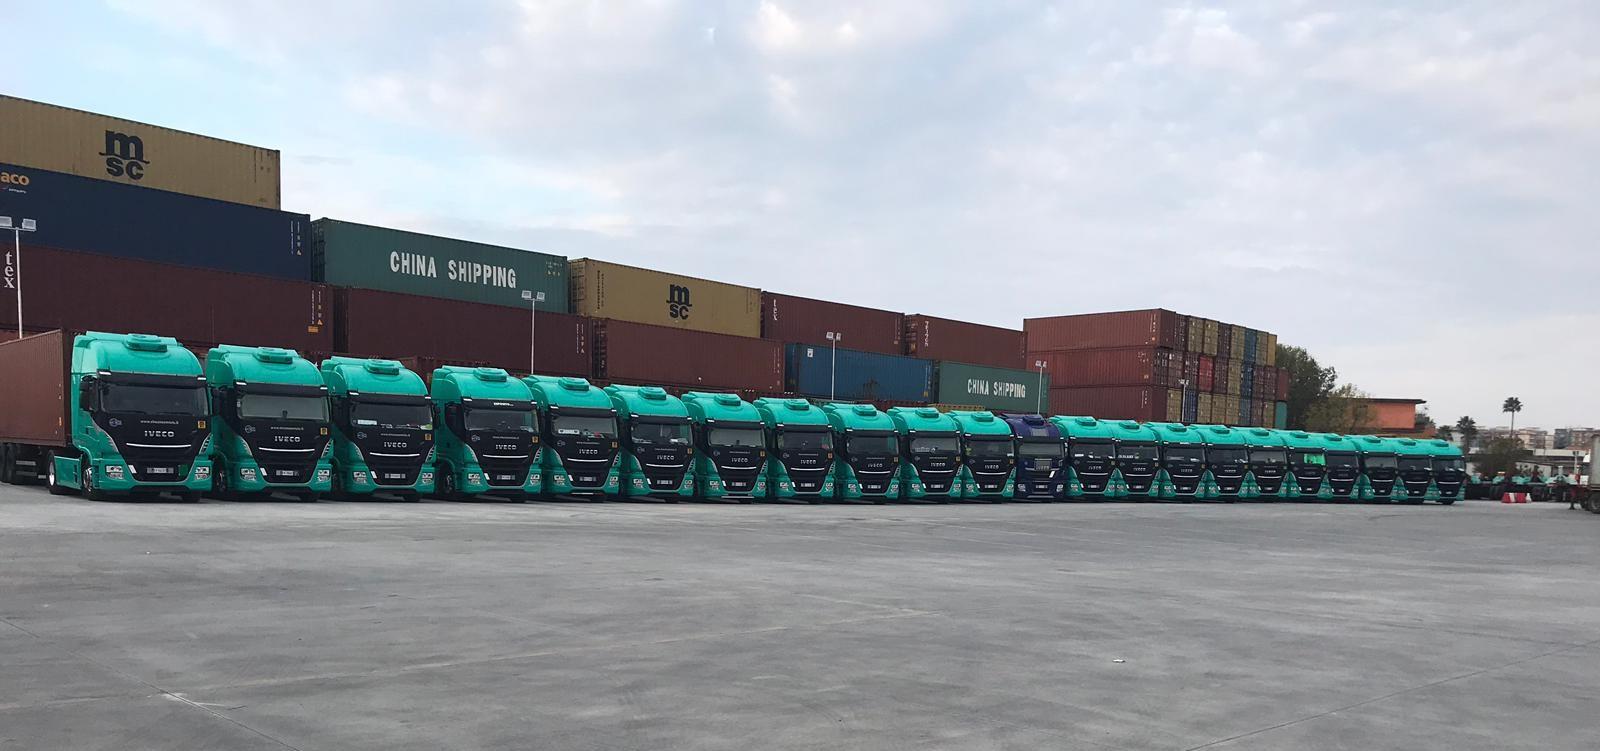 flotta staff vincenzo miele trasporti campania